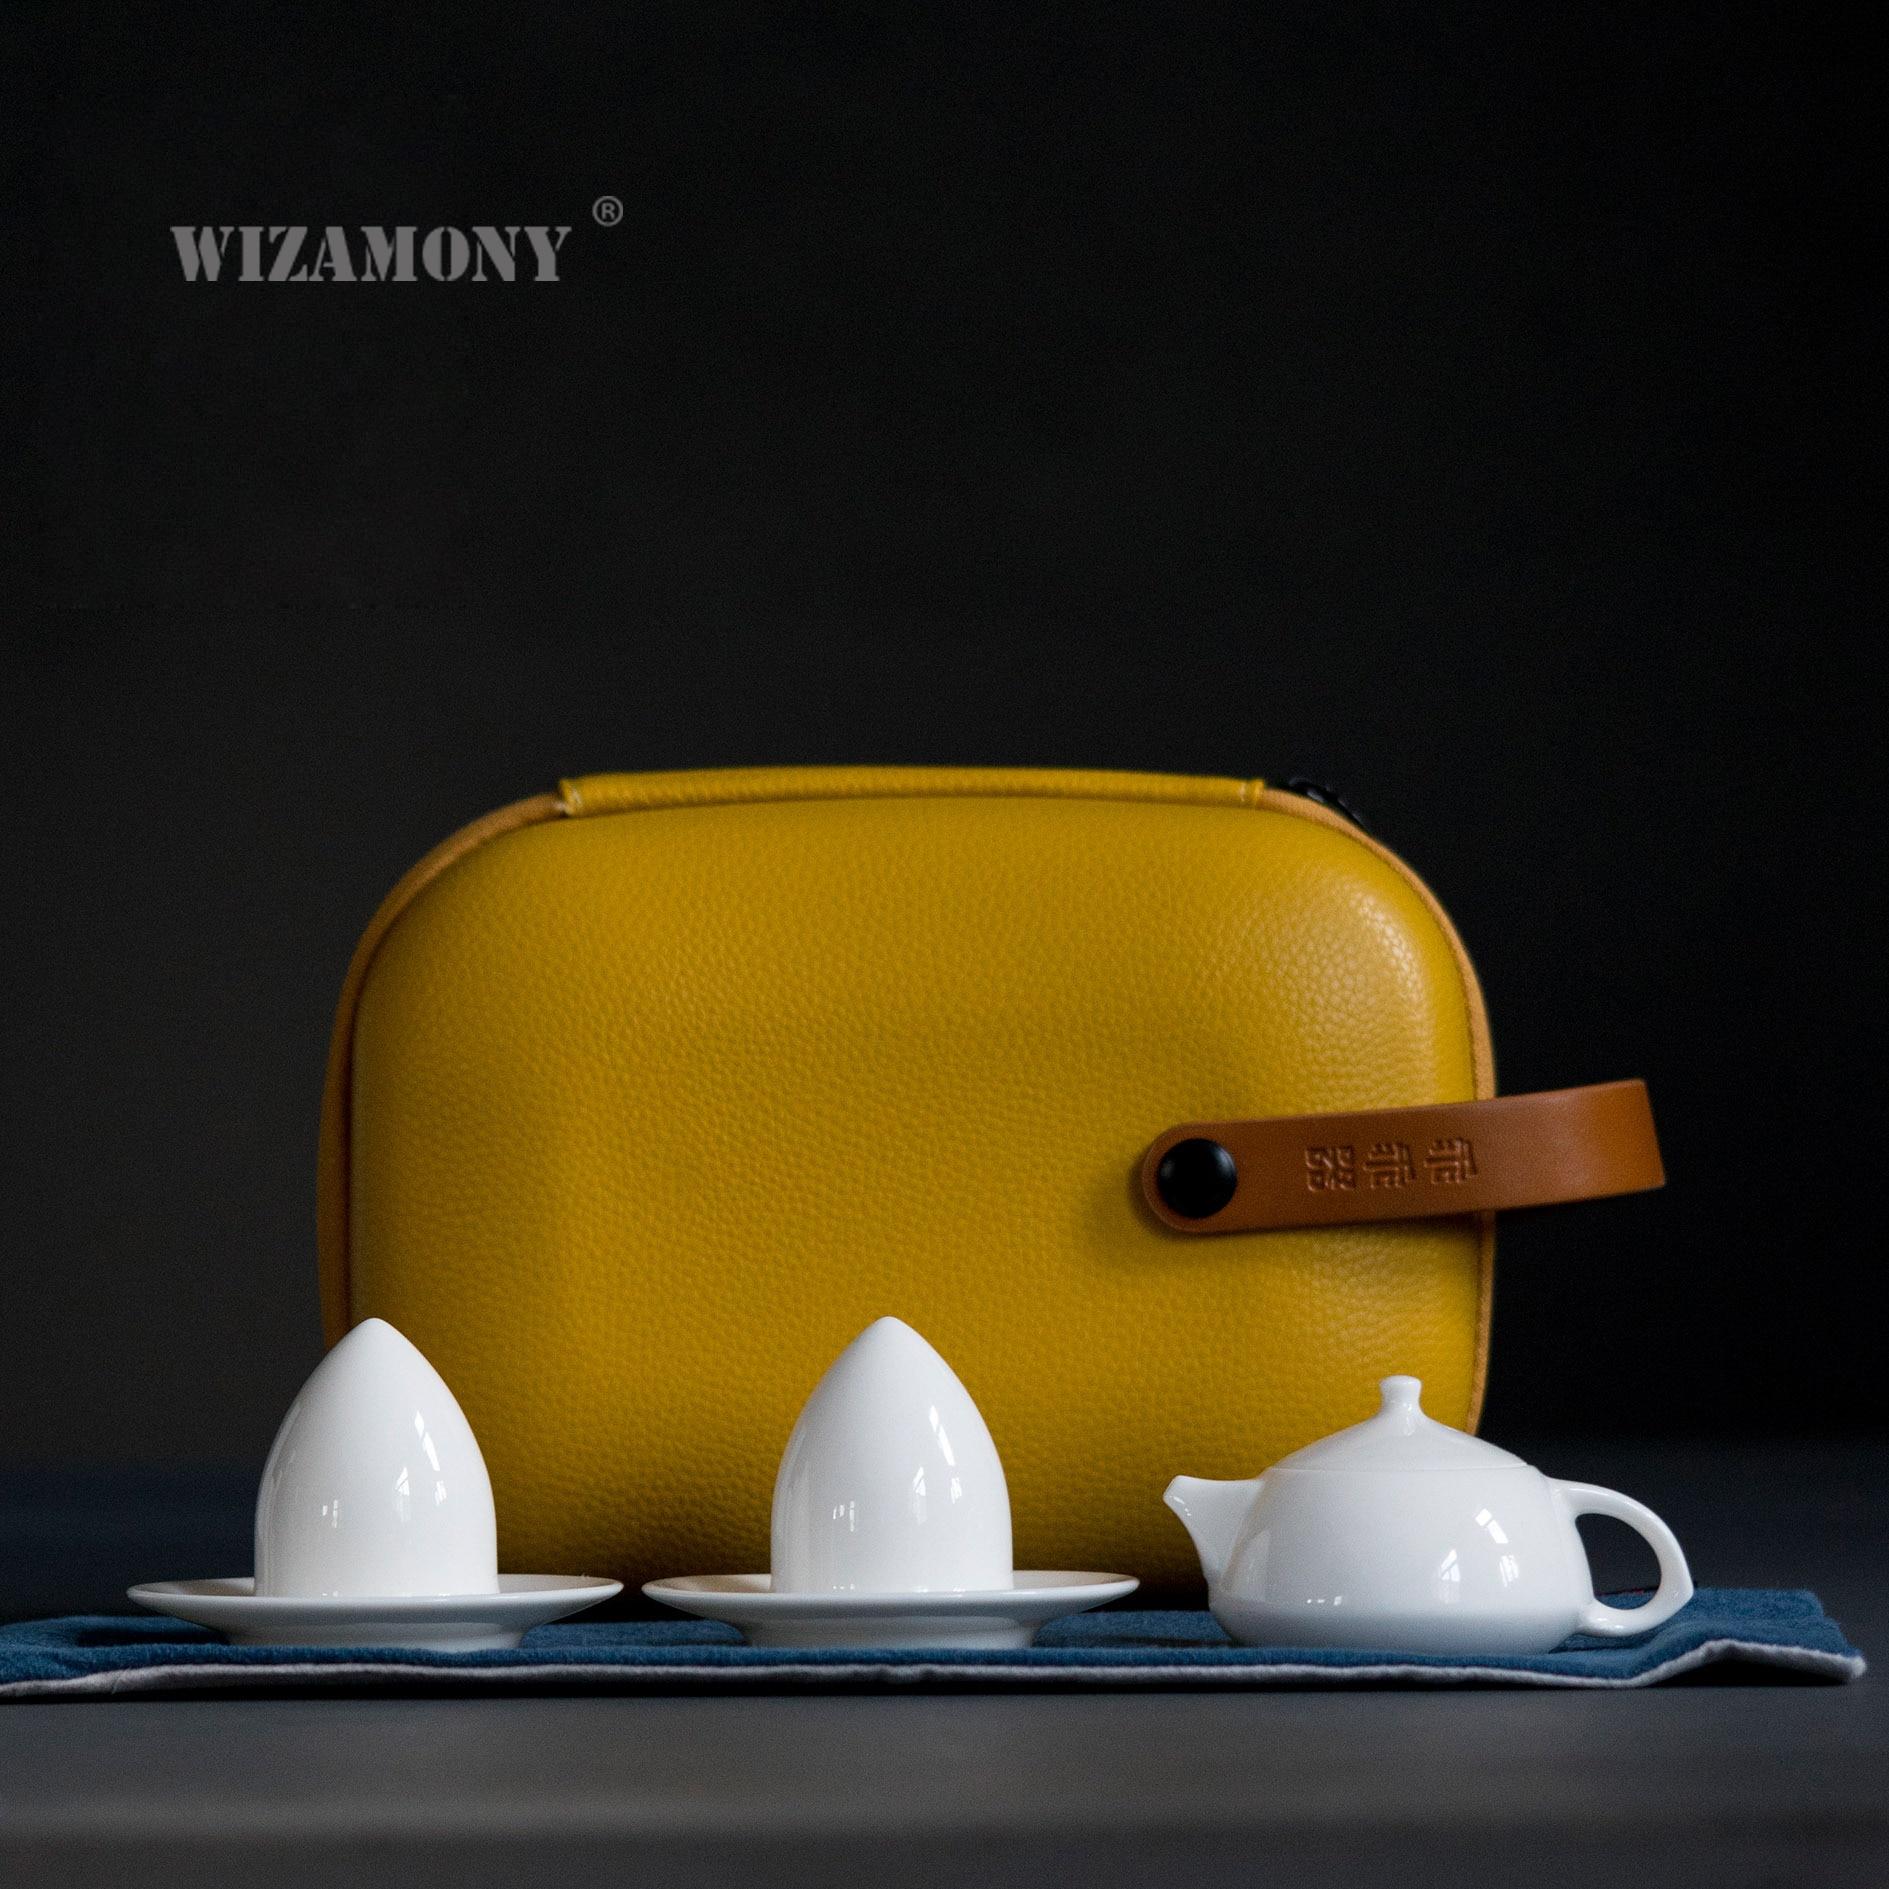 WIZAMONY-طقم شاي الكونغ فو الصيني ، حقيبة سفر ، إبريق شاي gaiwan ، فنجان معرض ، أطقم شاي سيراميك أبيض ، هدايا للأطفال ، أدوات الشرب